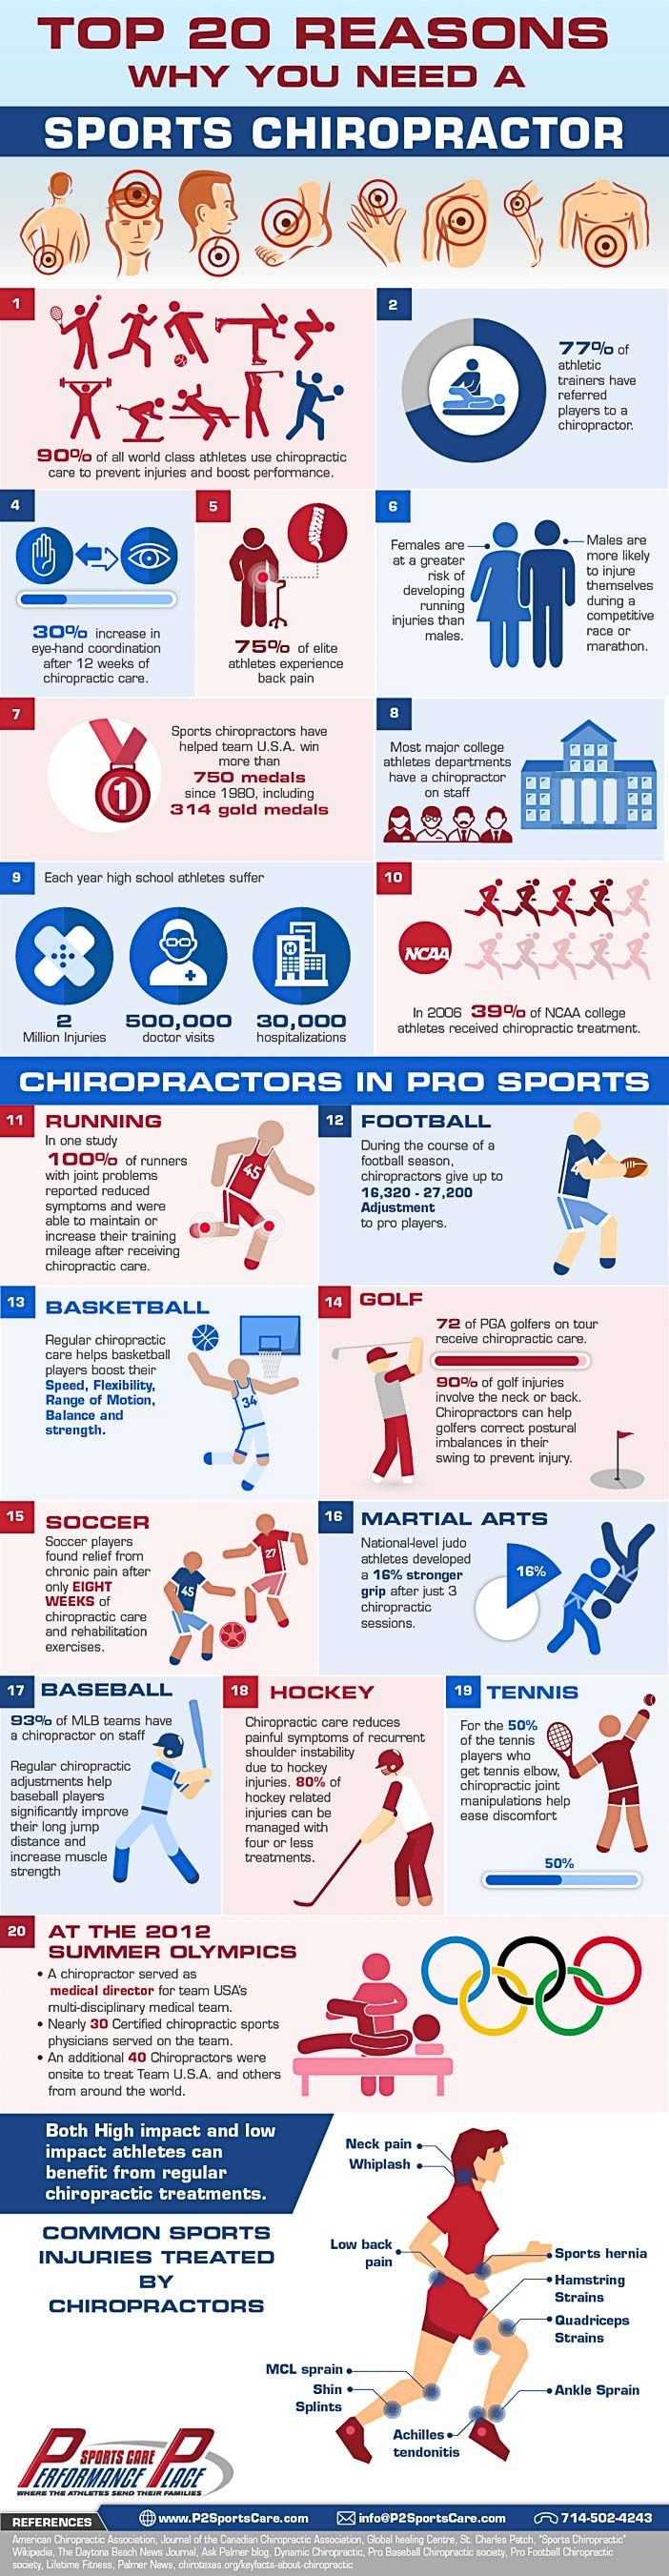 http://www.p2sportscare.com/sports-chiropractor-2/